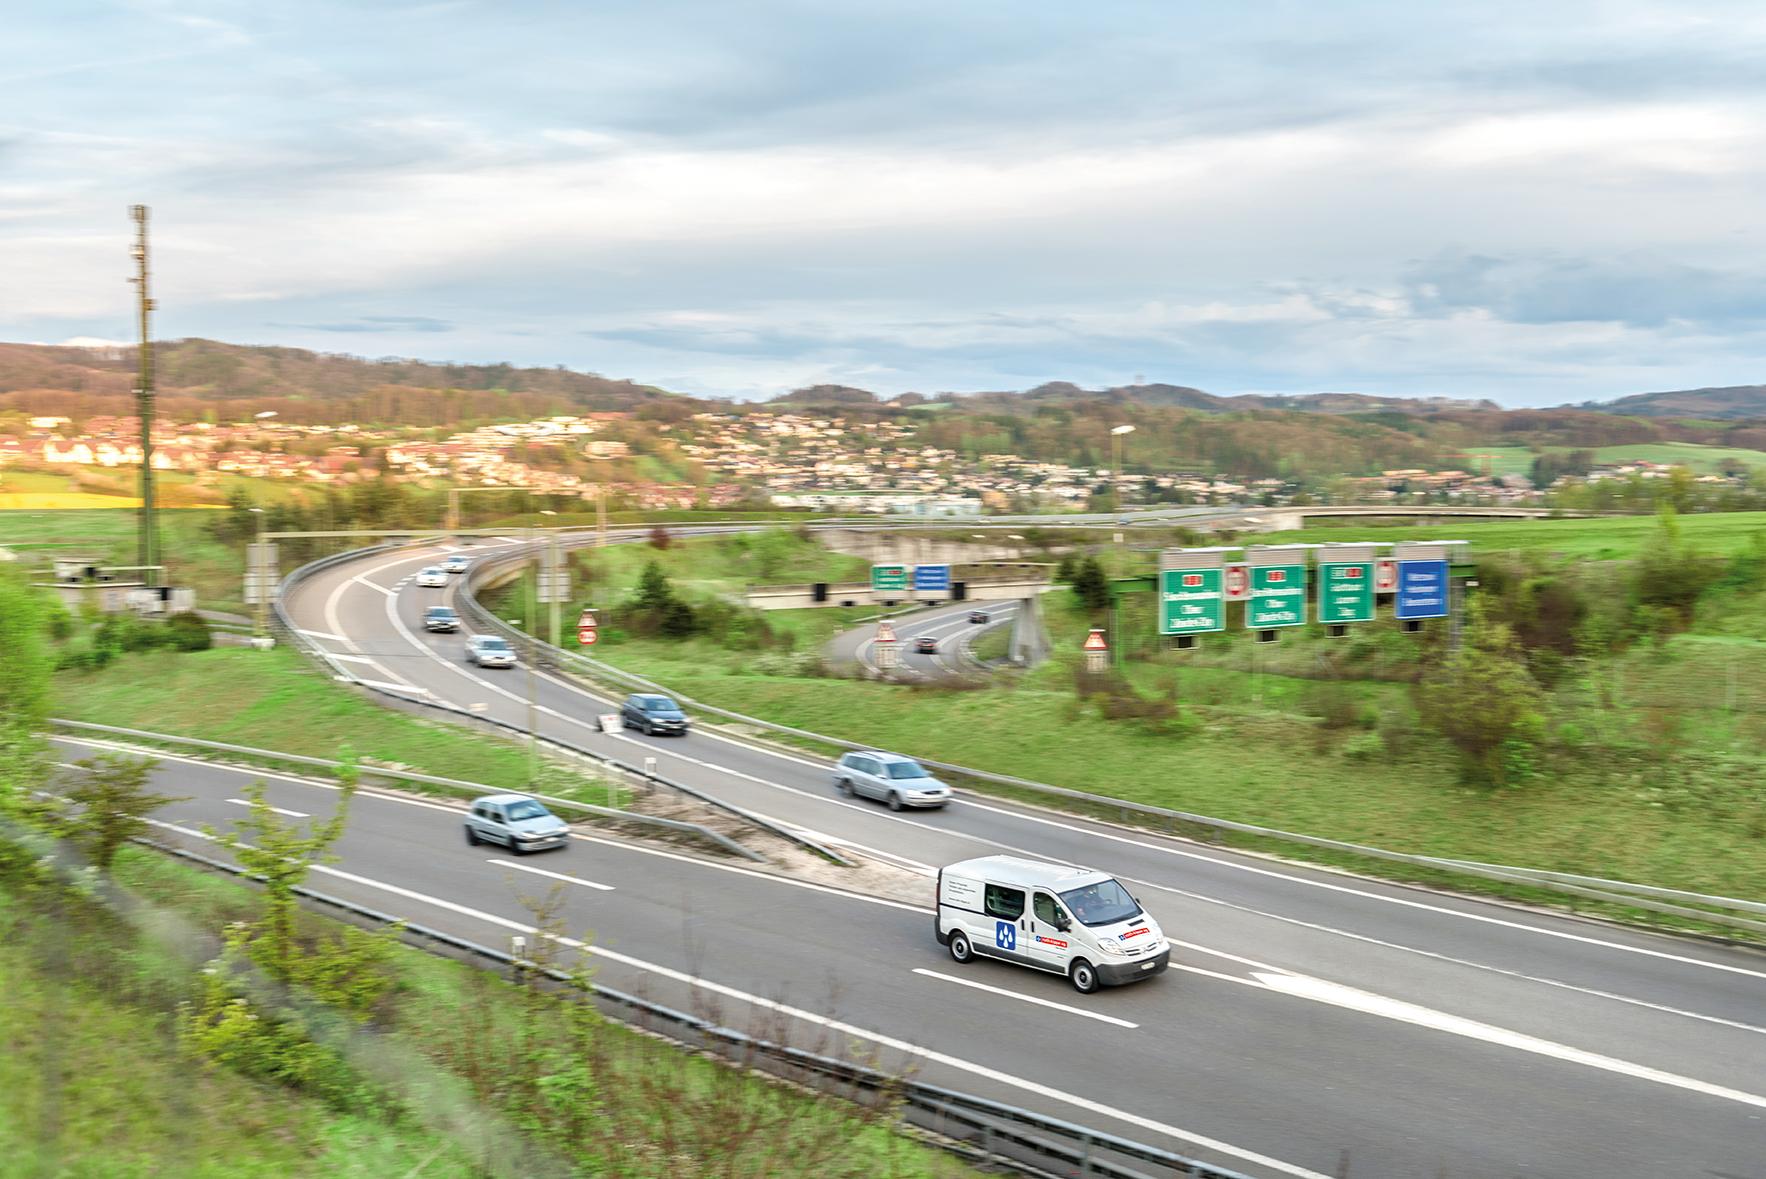 ROK_Autobahn-Busy-1_korr_RGB